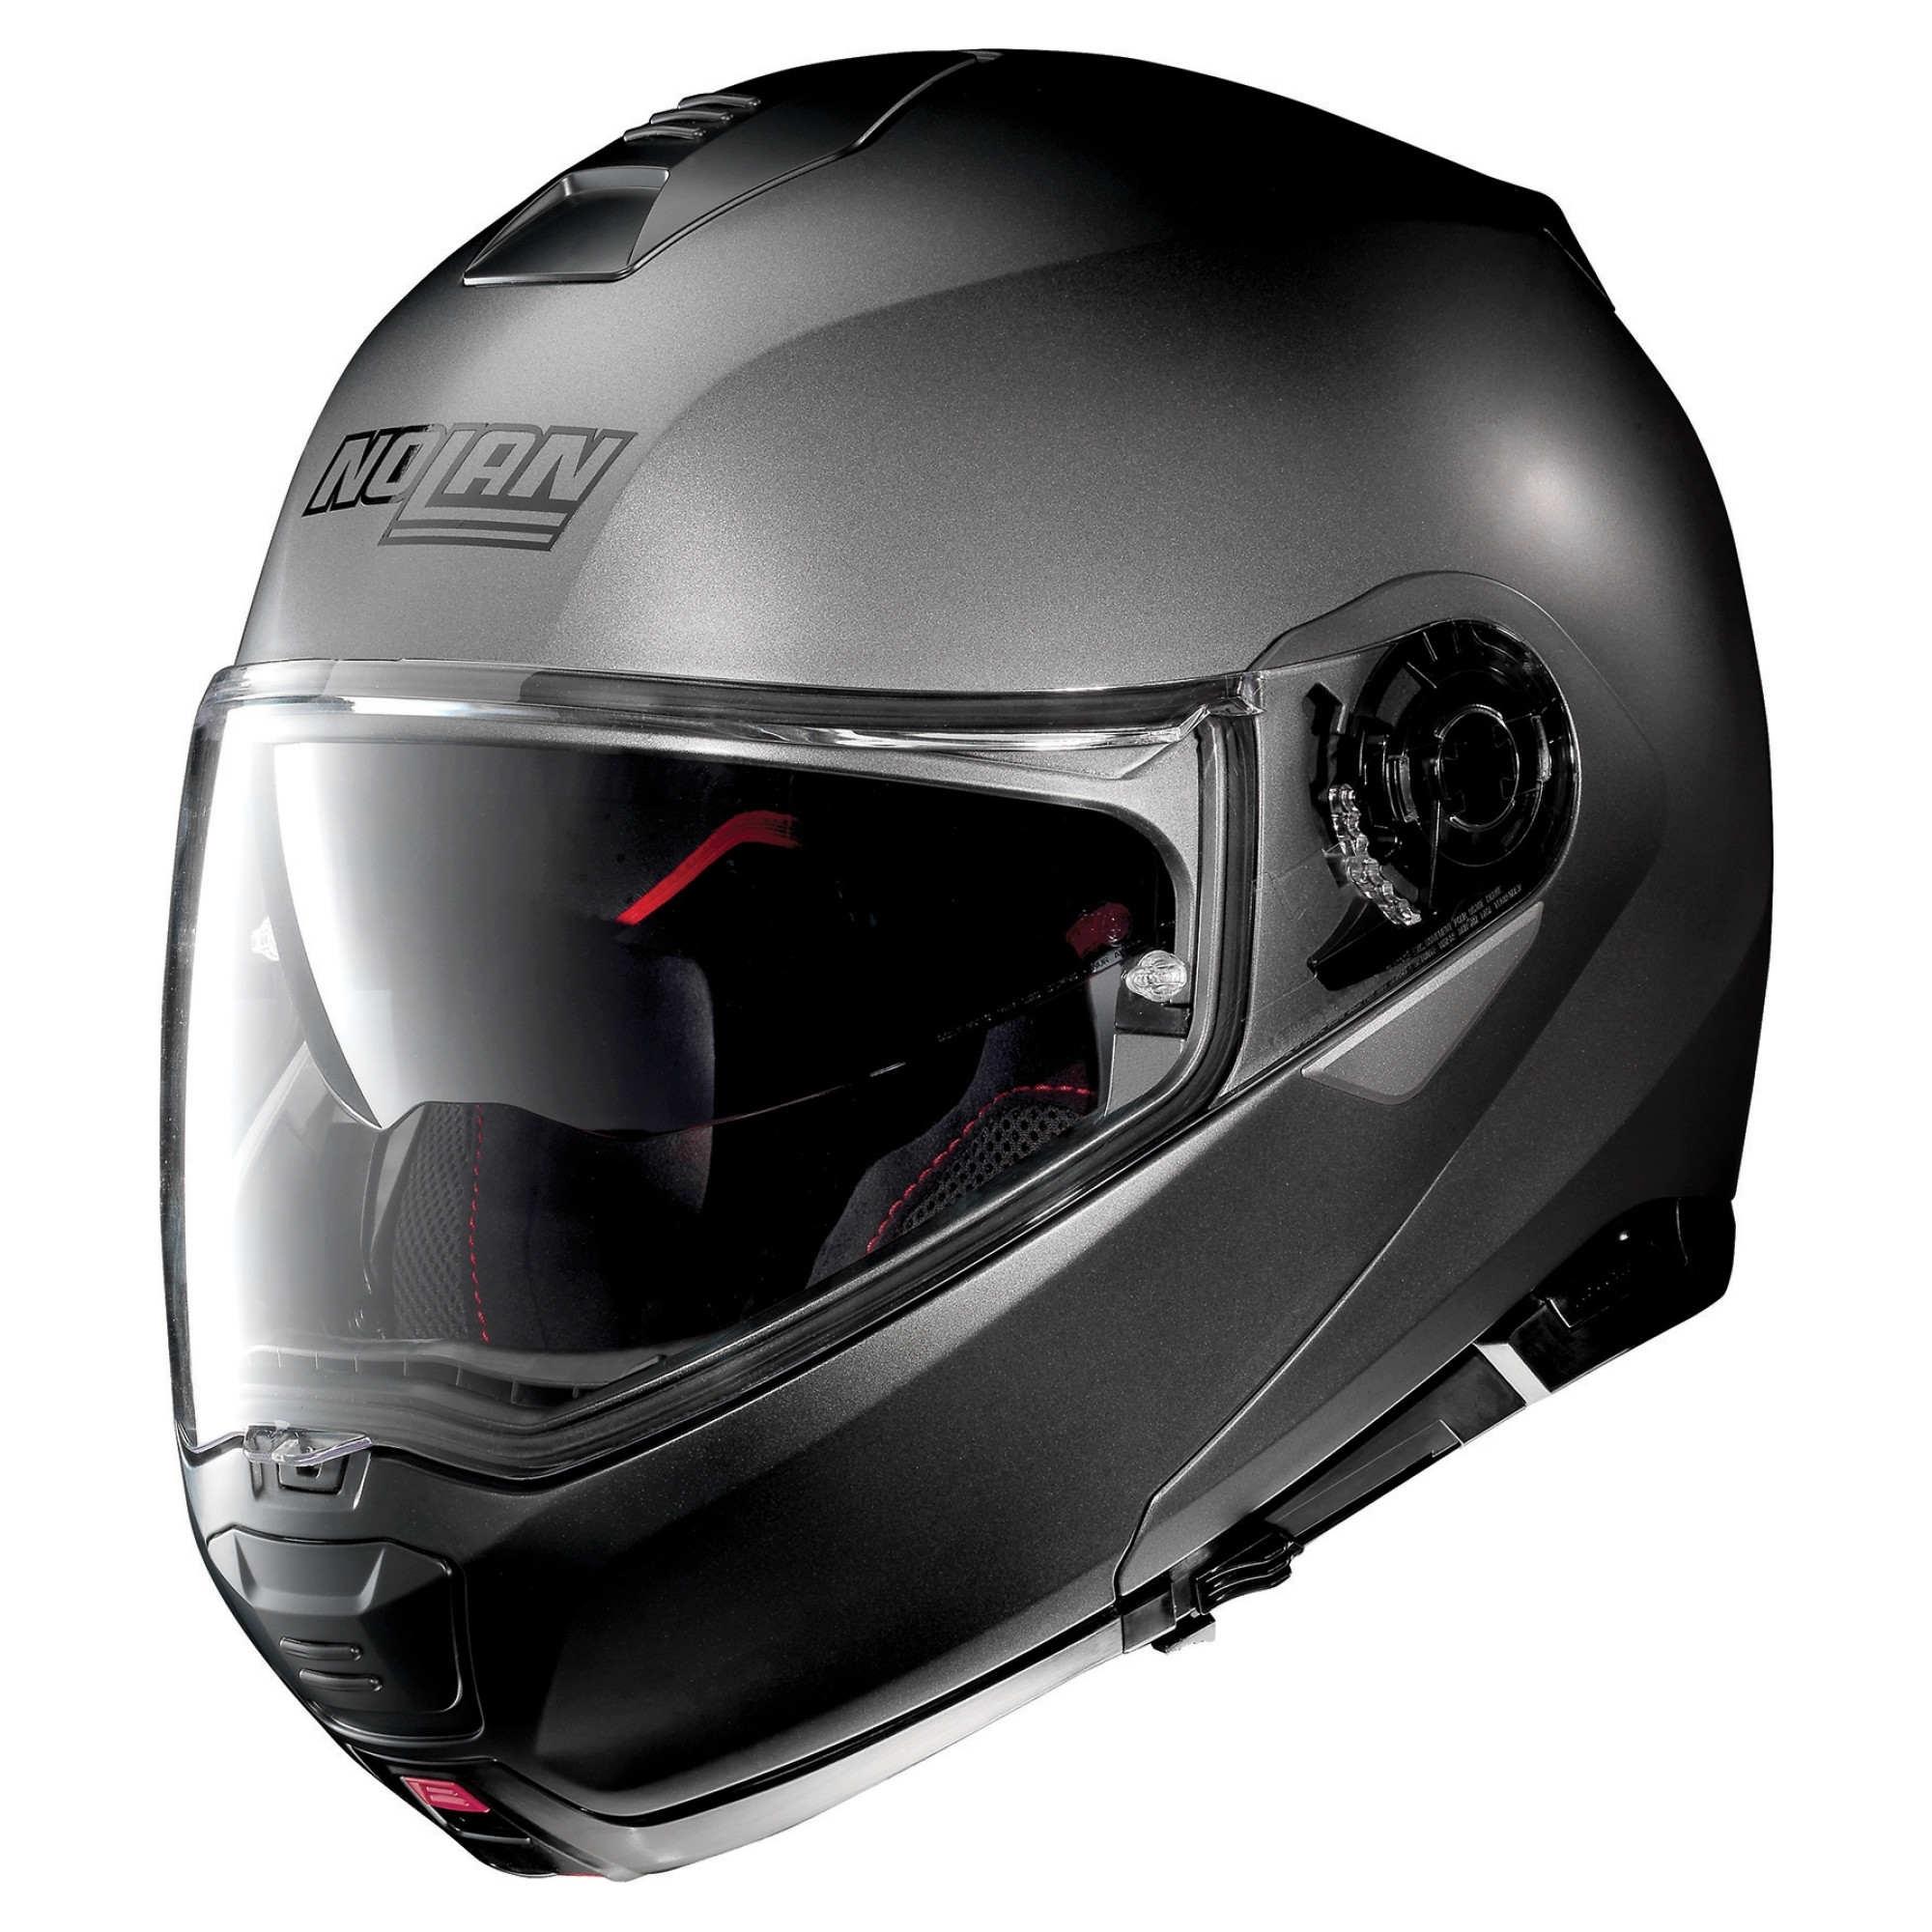 Nolan-N100-5-black fade